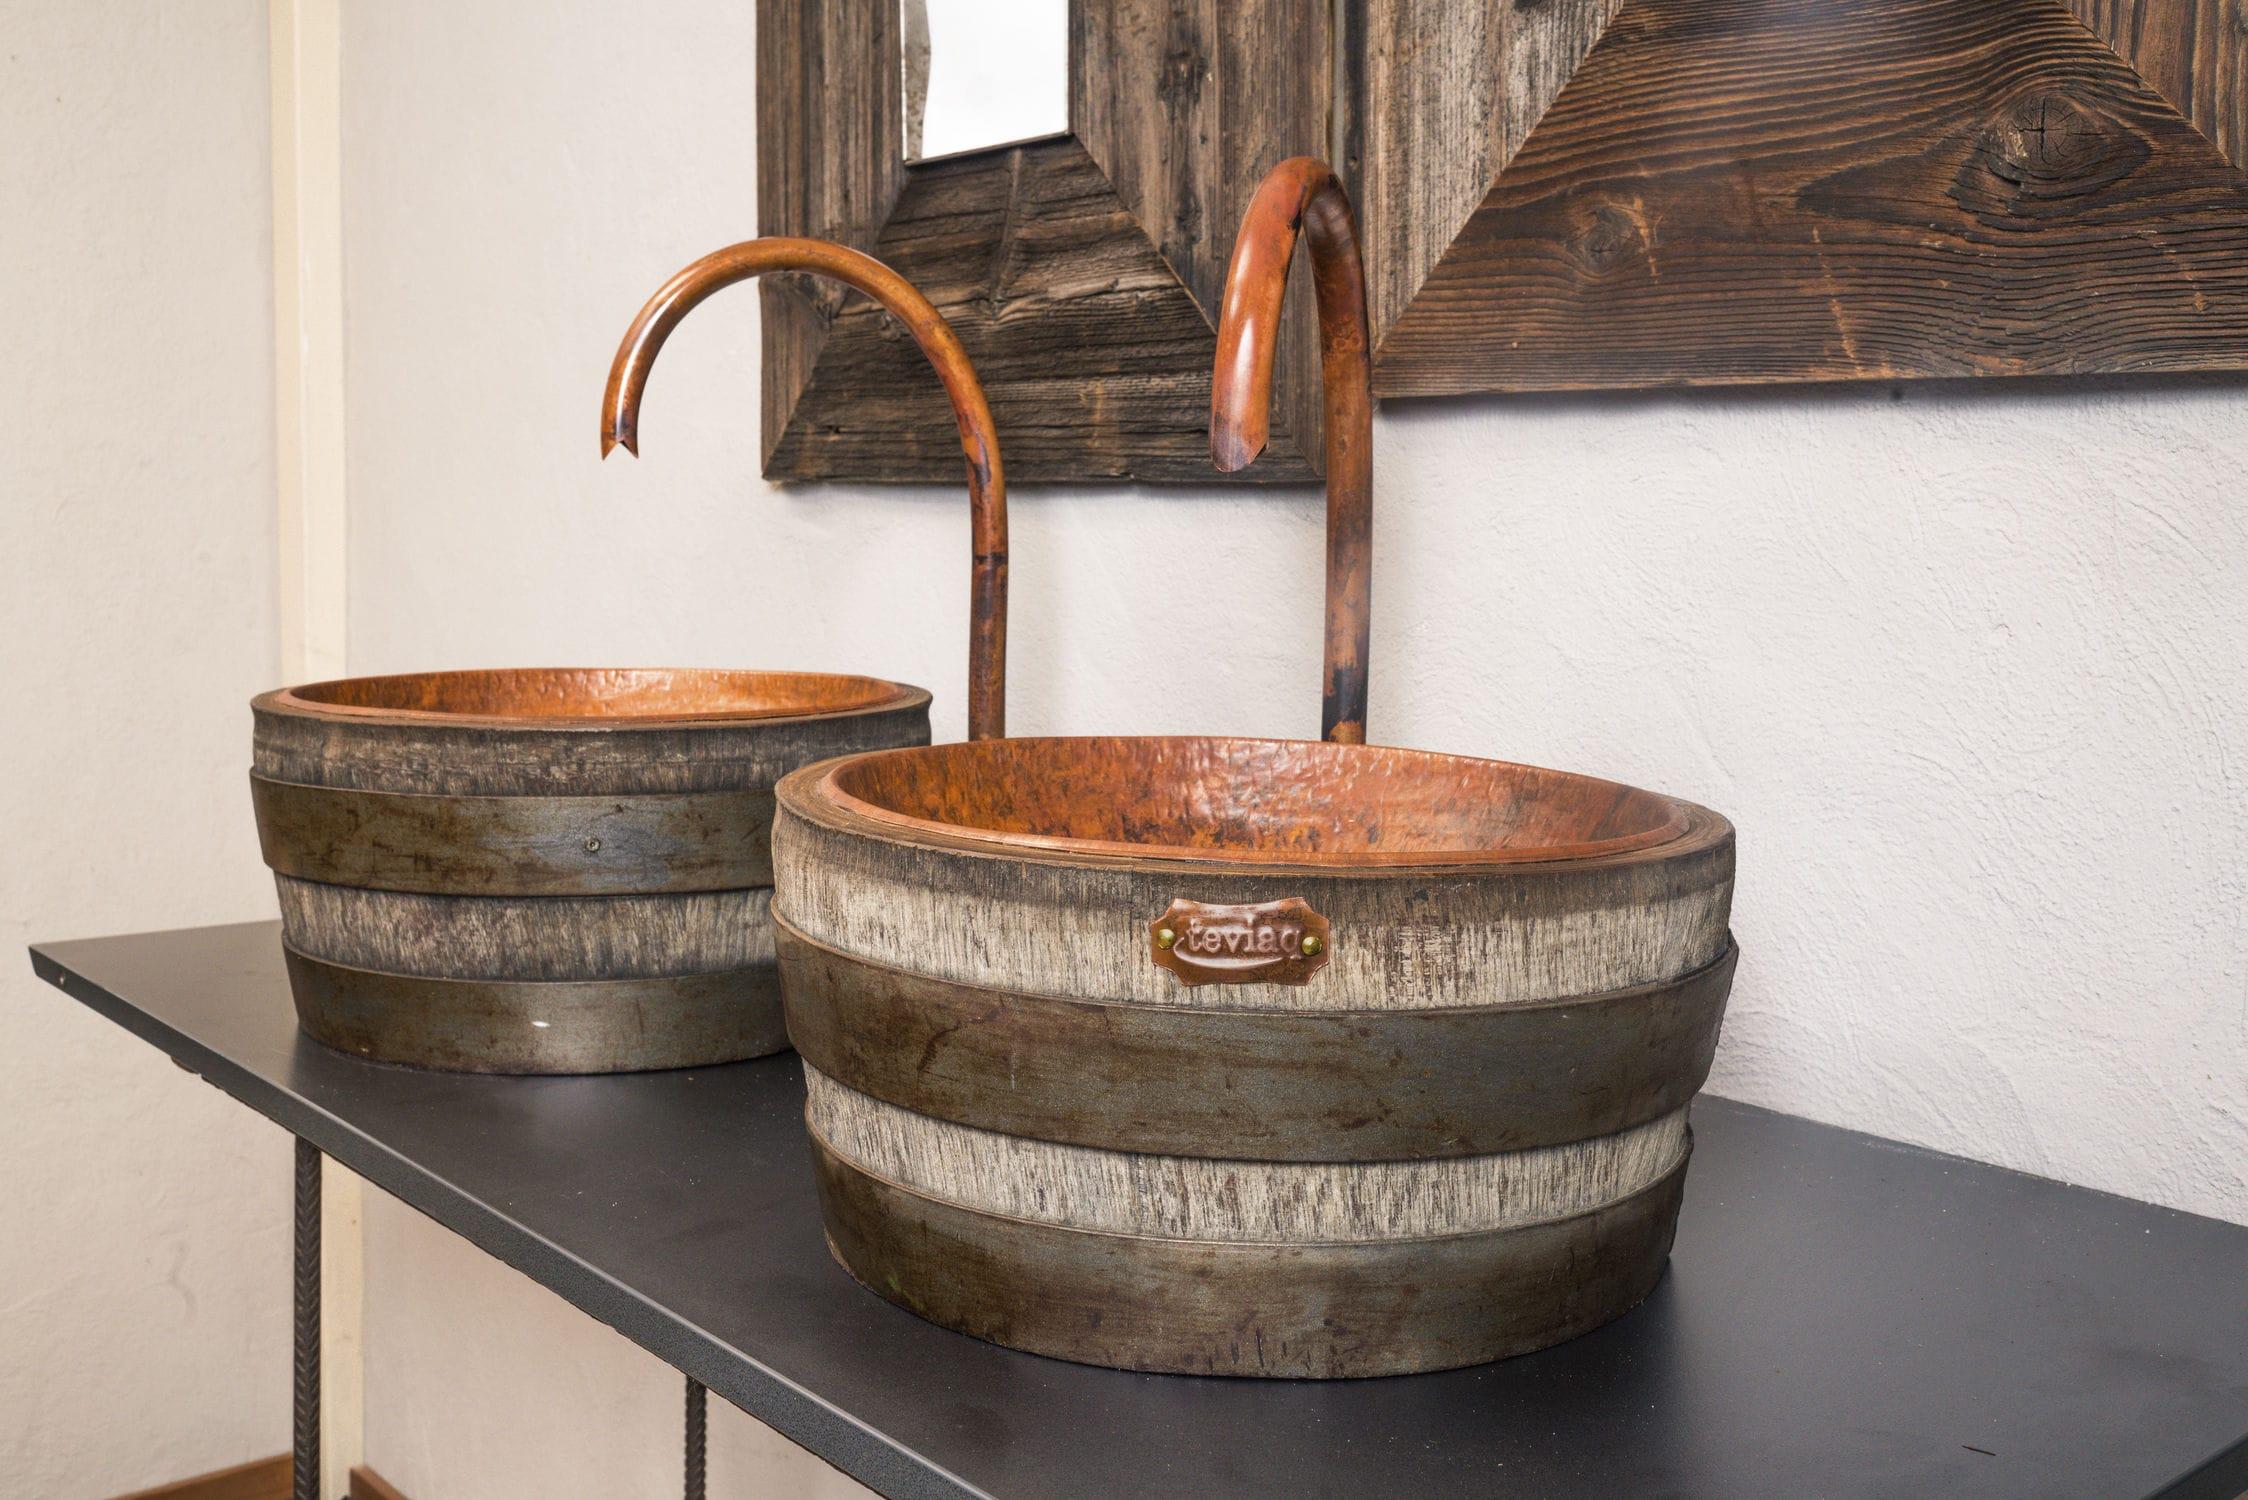 Vasca Da Bagno In Rame Prezzi : Vasche da bagno di piccole dimensioni